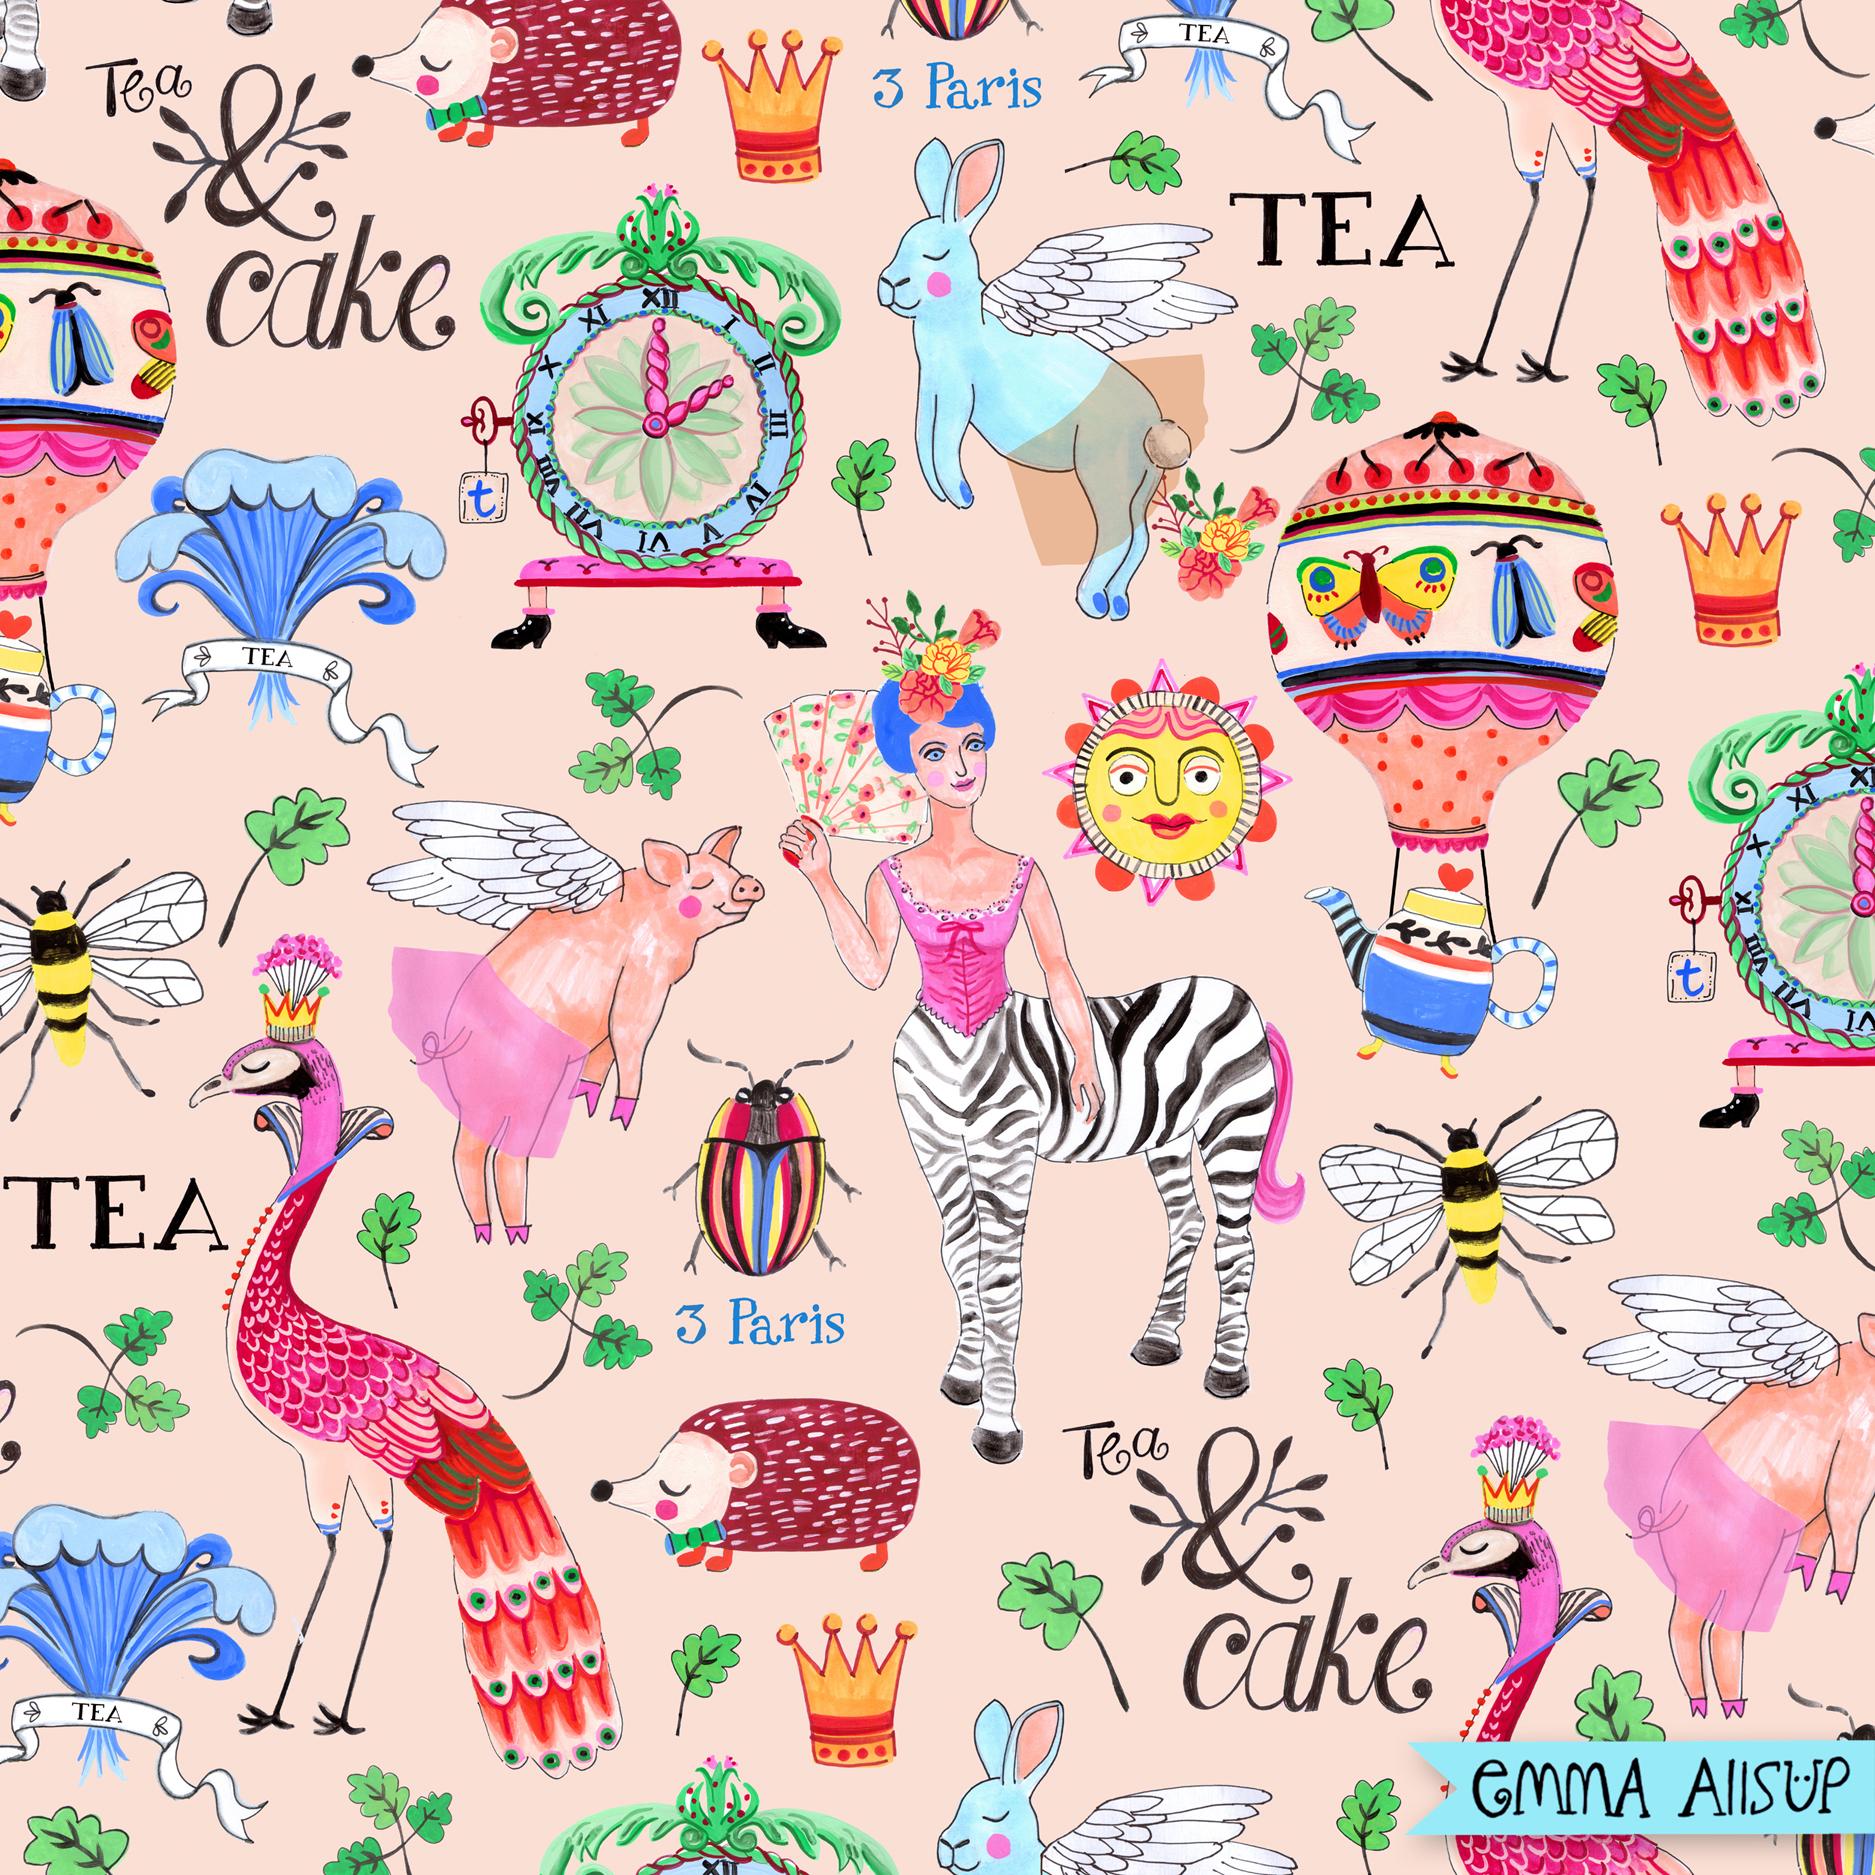 novelty-napkin-emmajayne-designs.jpg